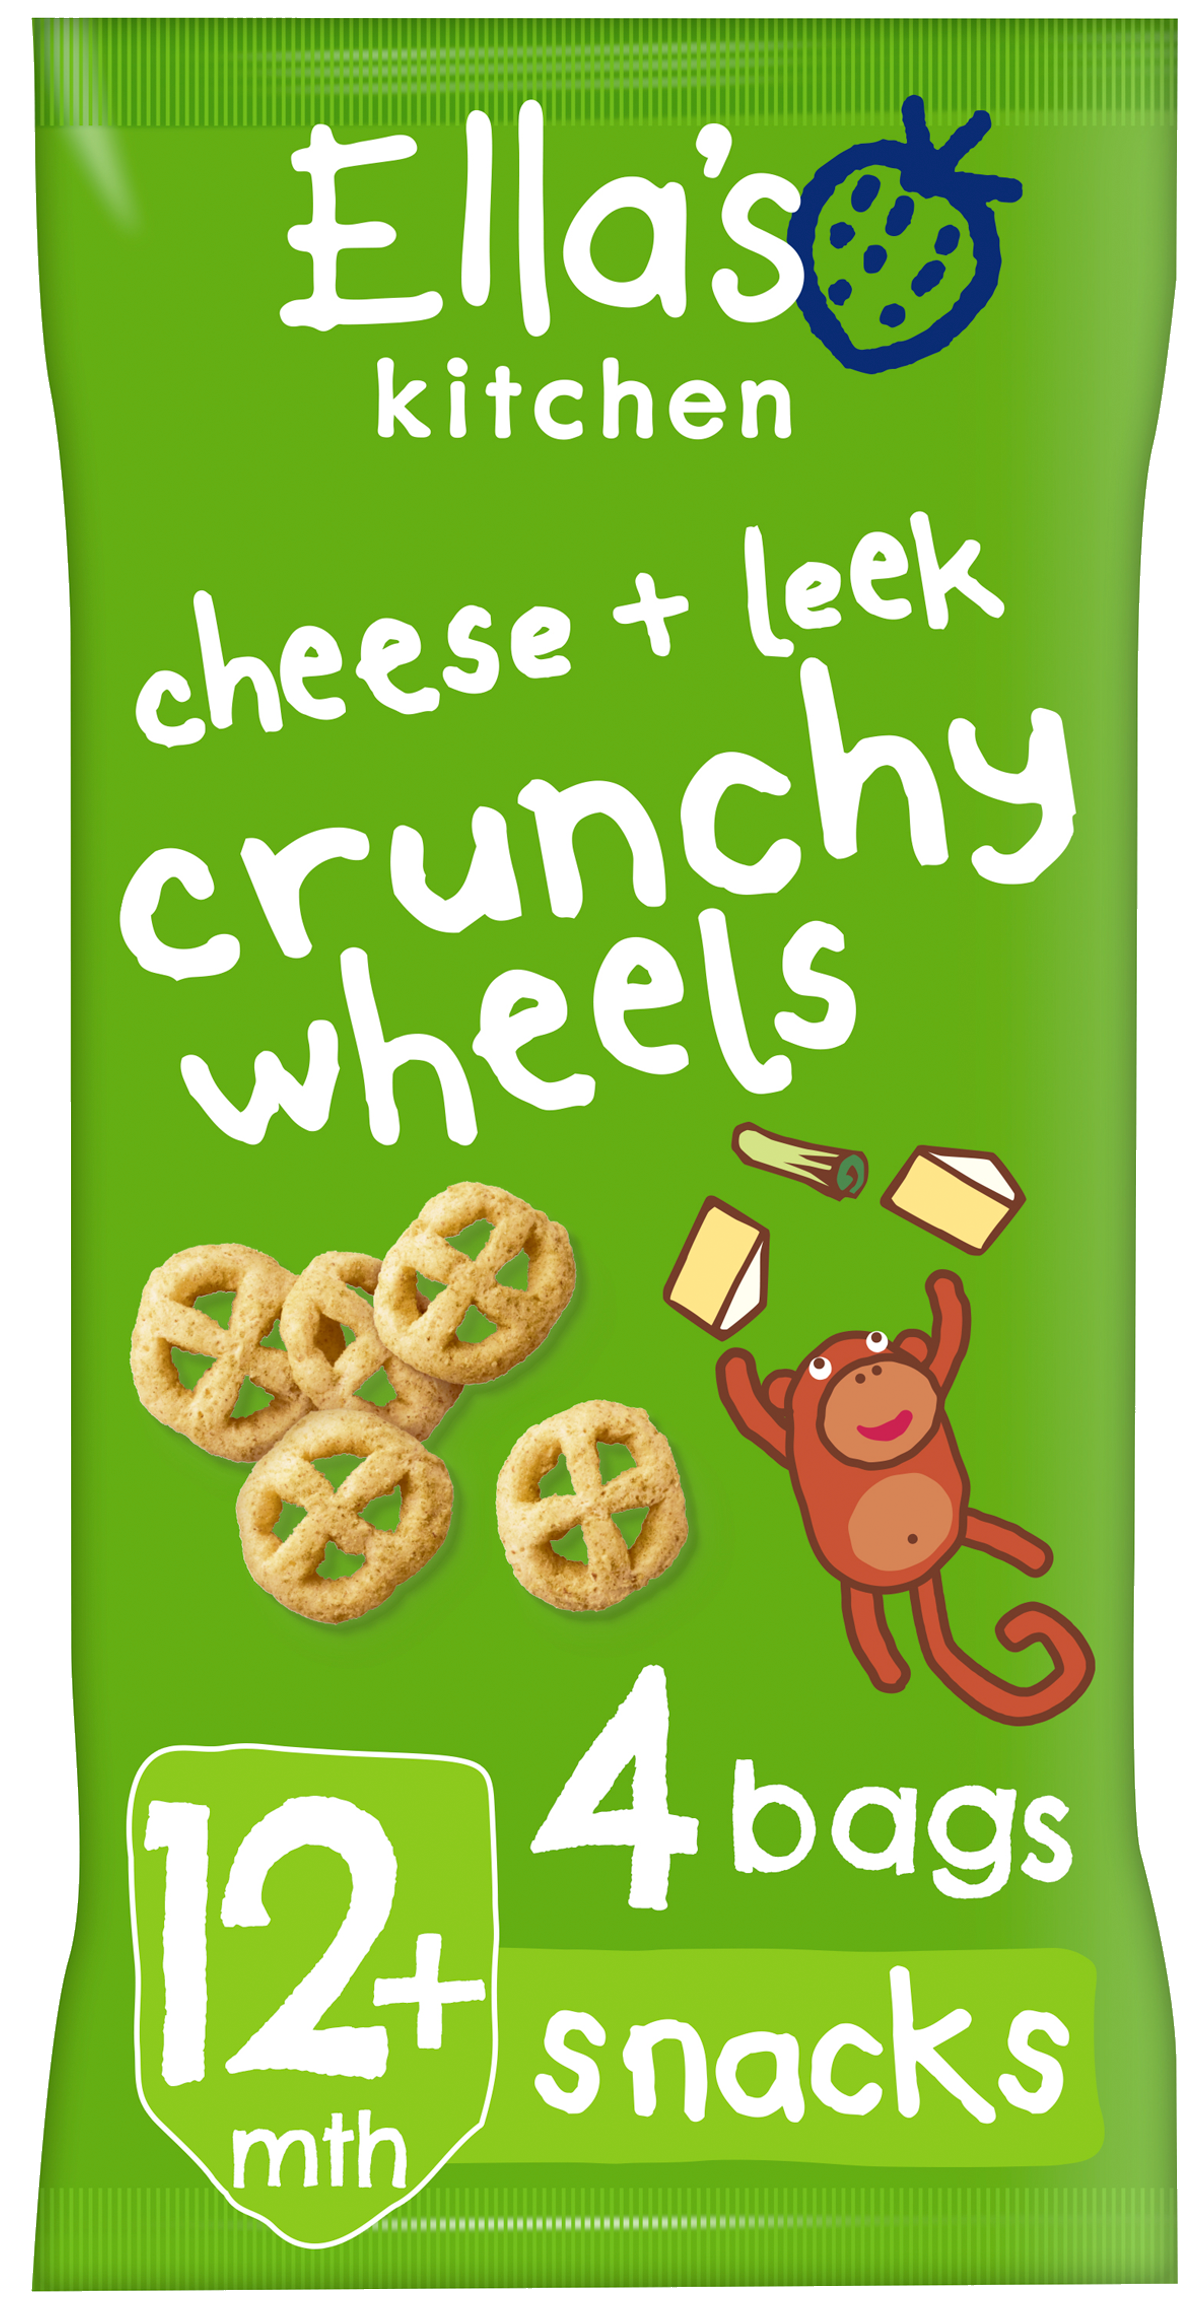 Ellas kitchen crunchy wheels cheese leek bag front of pack O